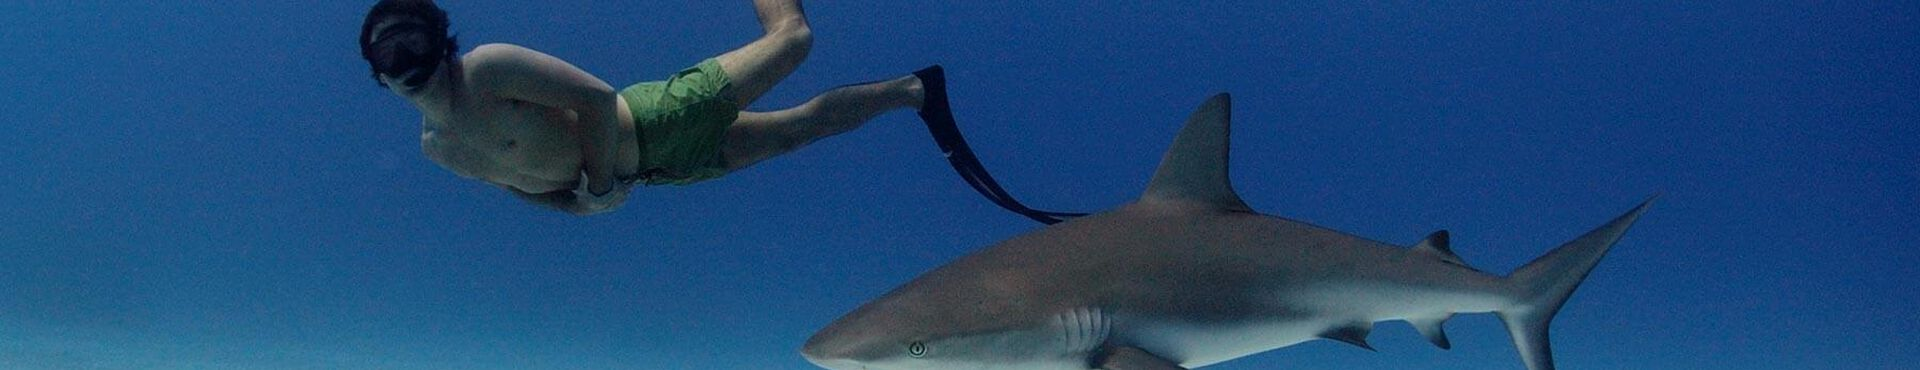 Banner - Save Sharks